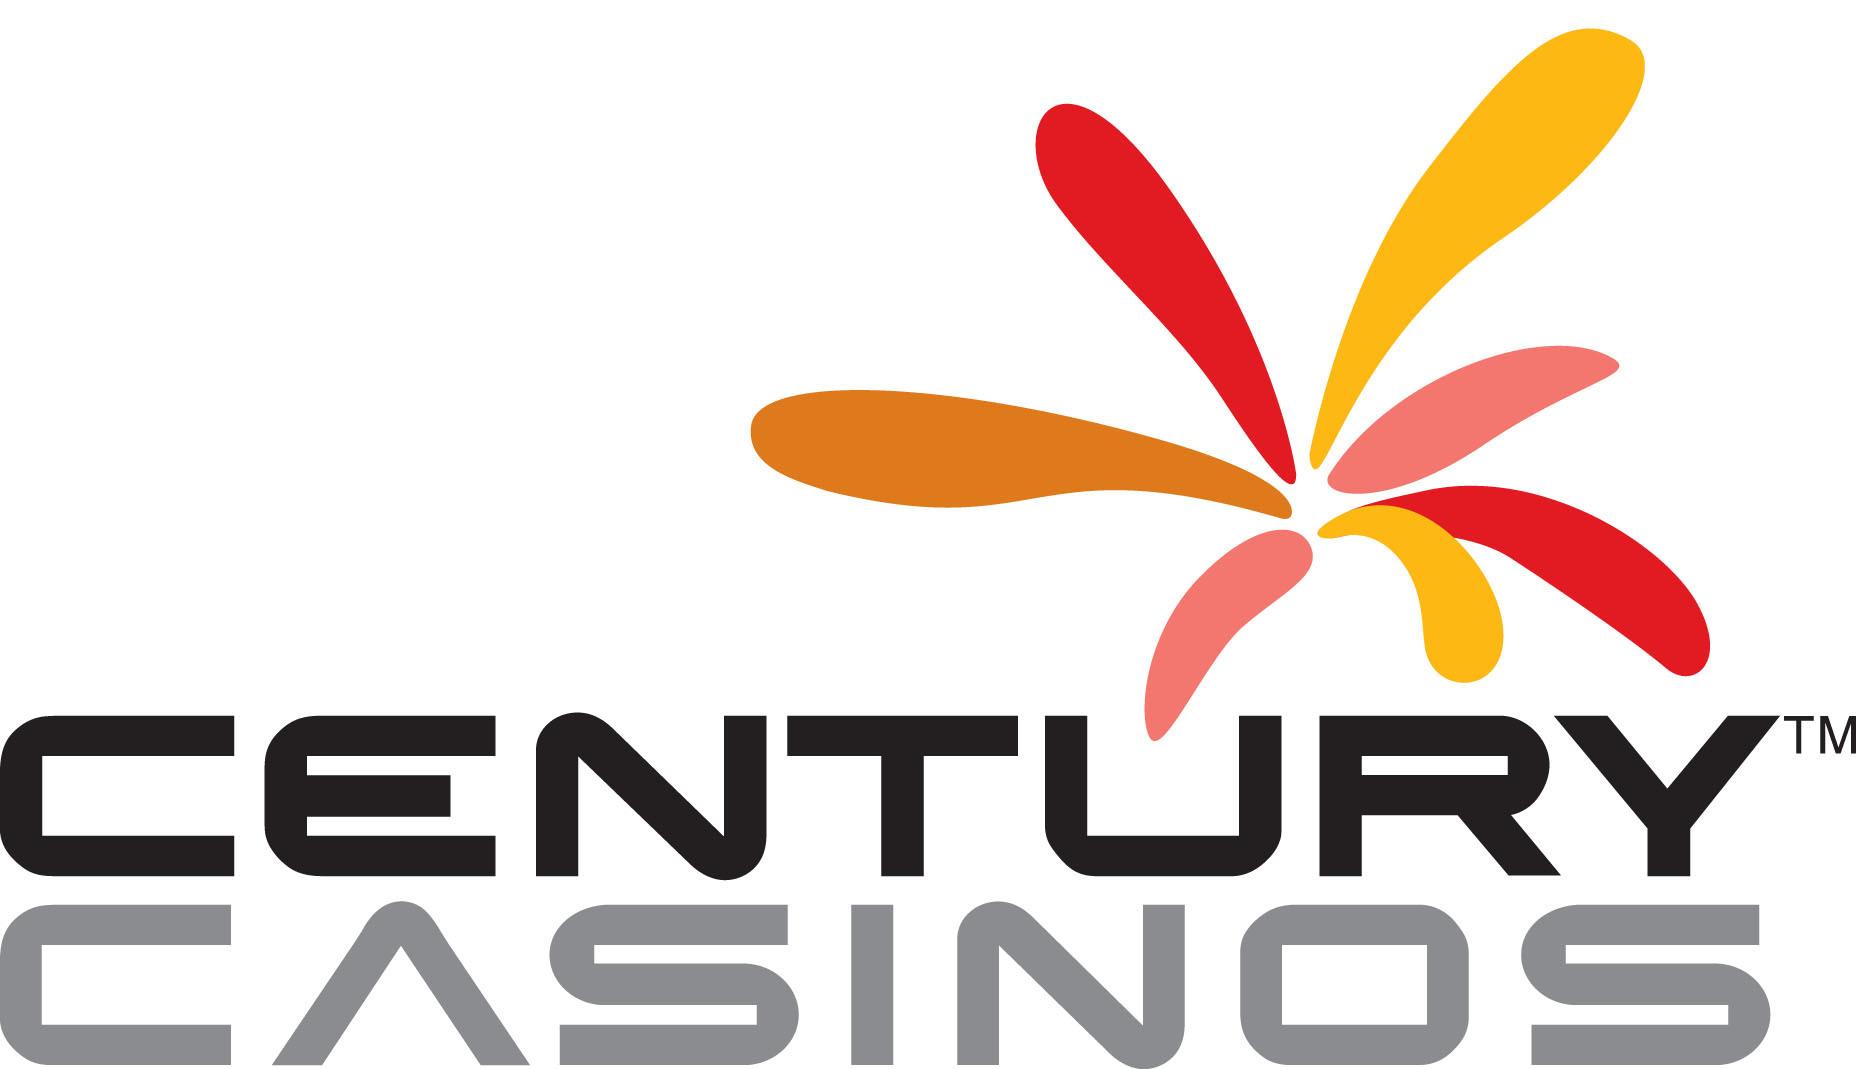 Century Casinos Inc